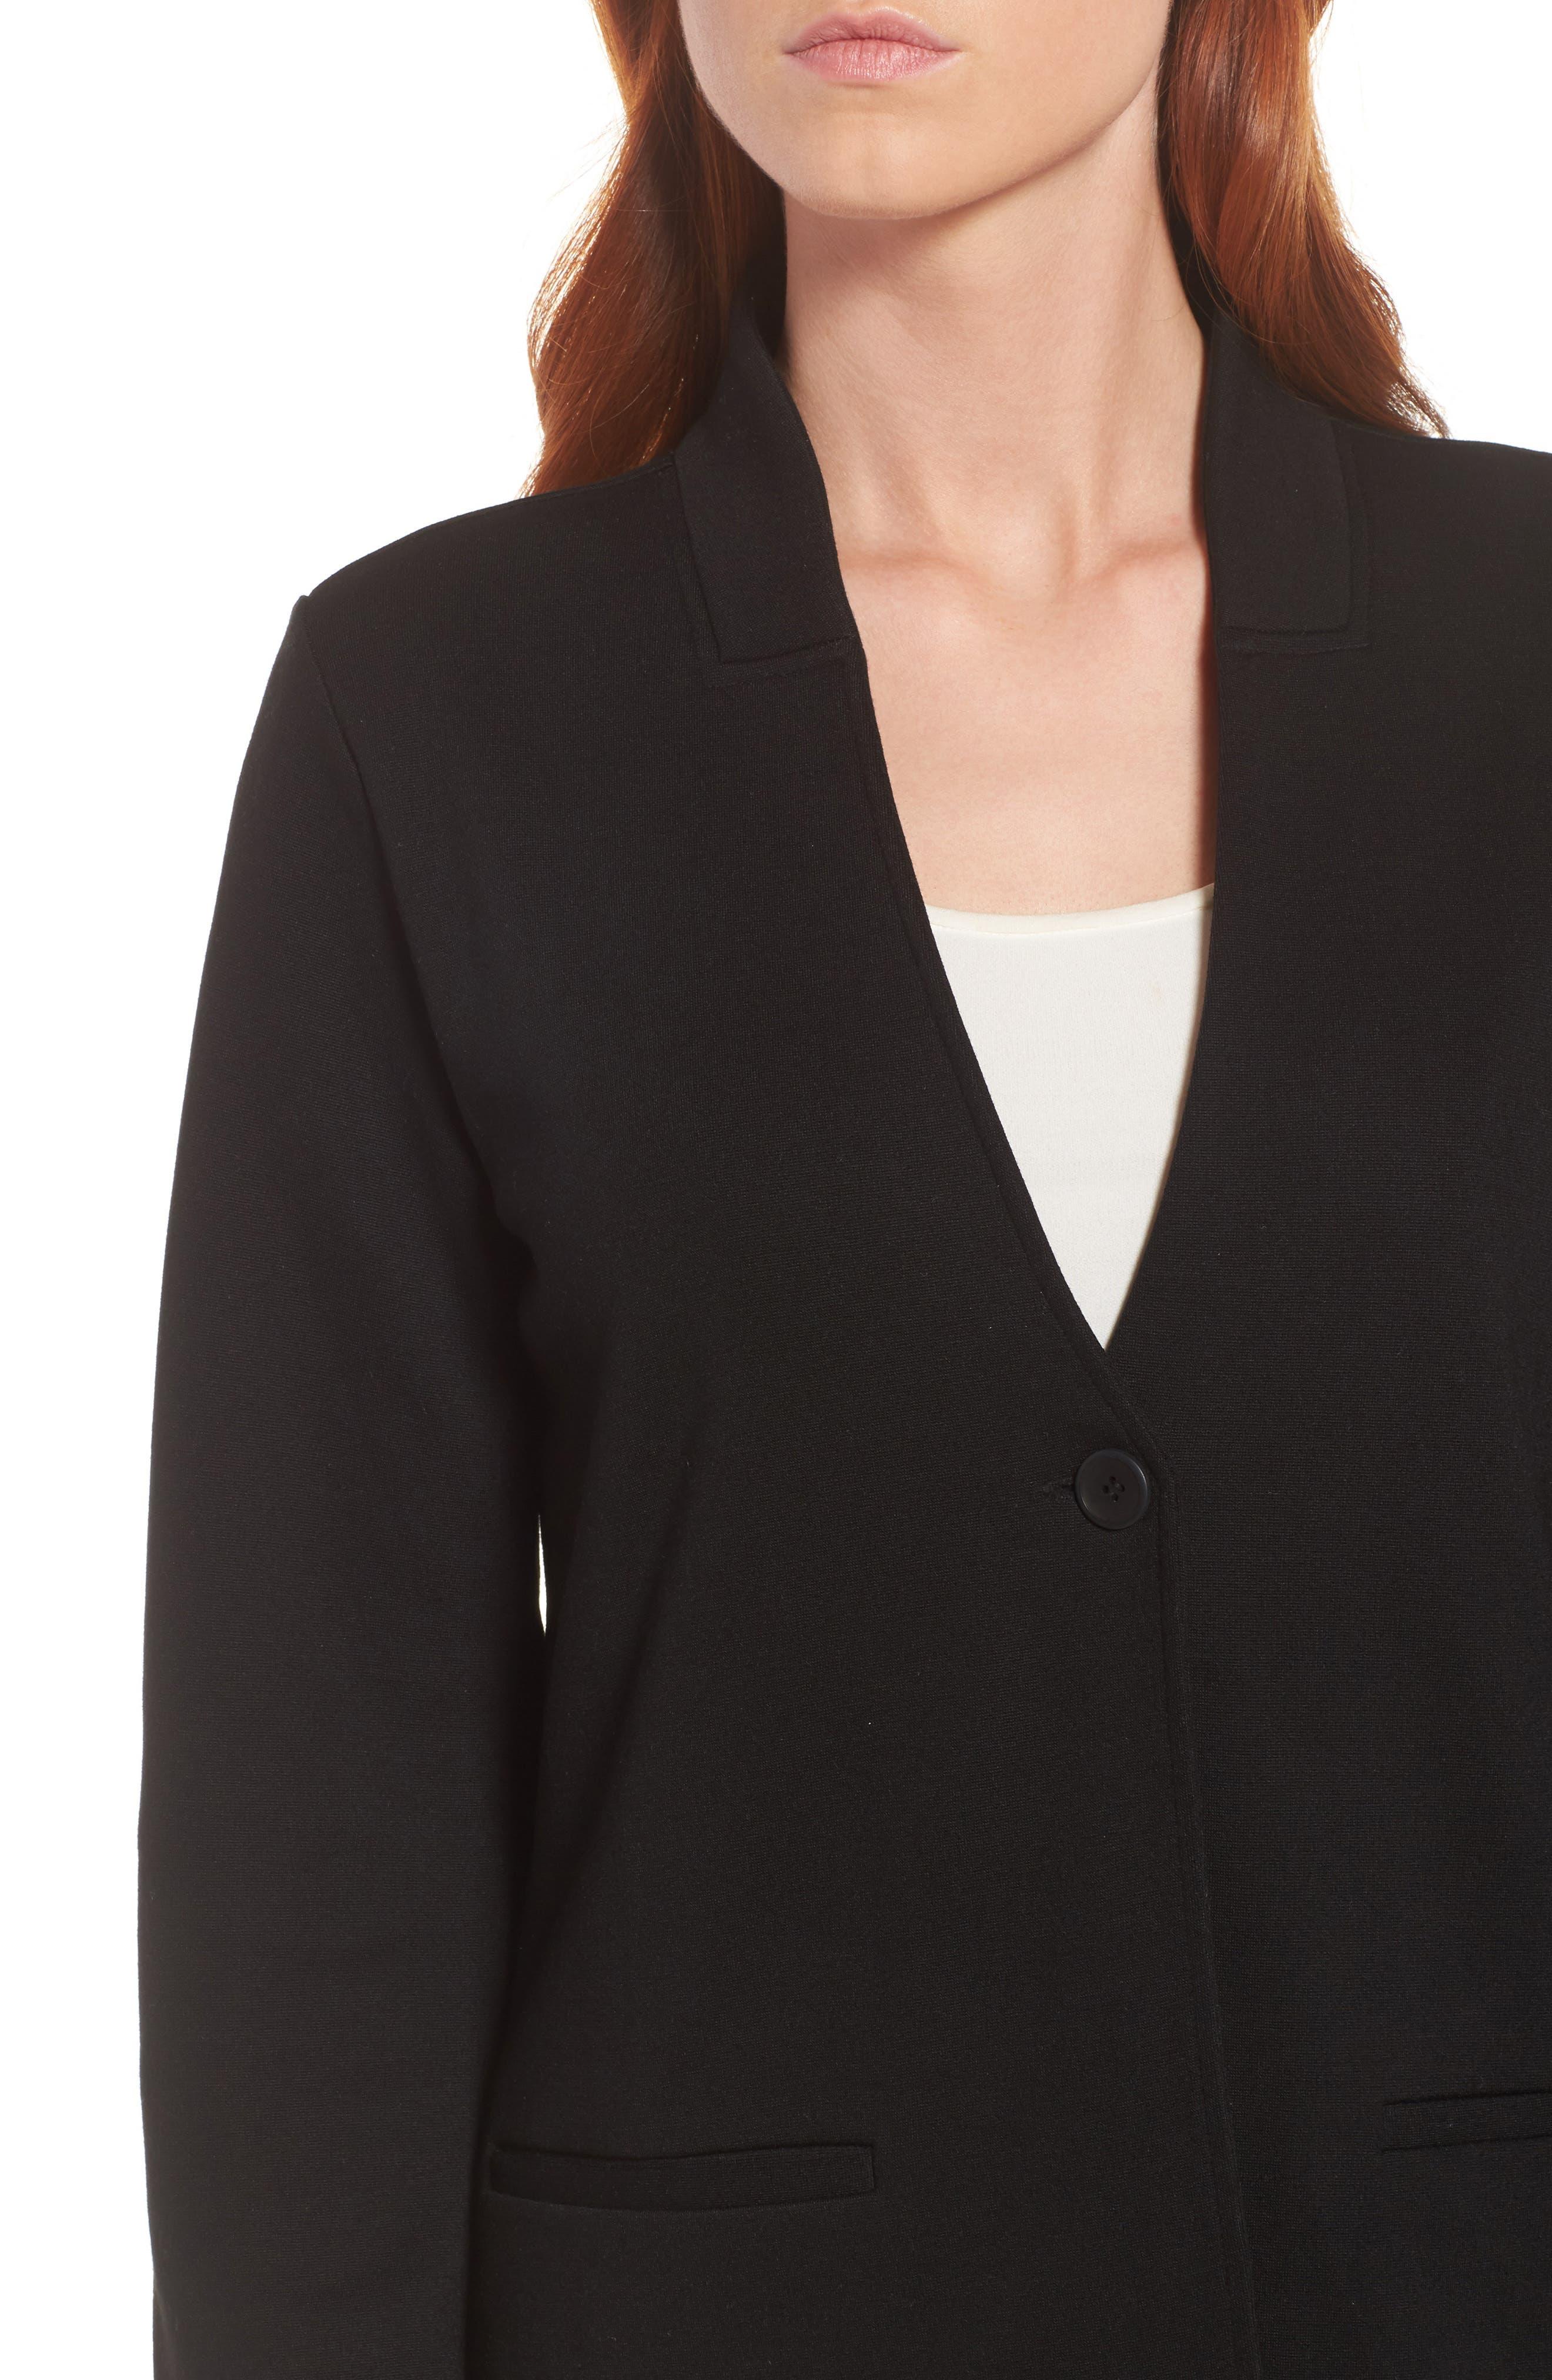 Tencel<sup>®</sup> Lyocell Blend Knit Blazer,                             Alternate thumbnail 4, color,                             Black